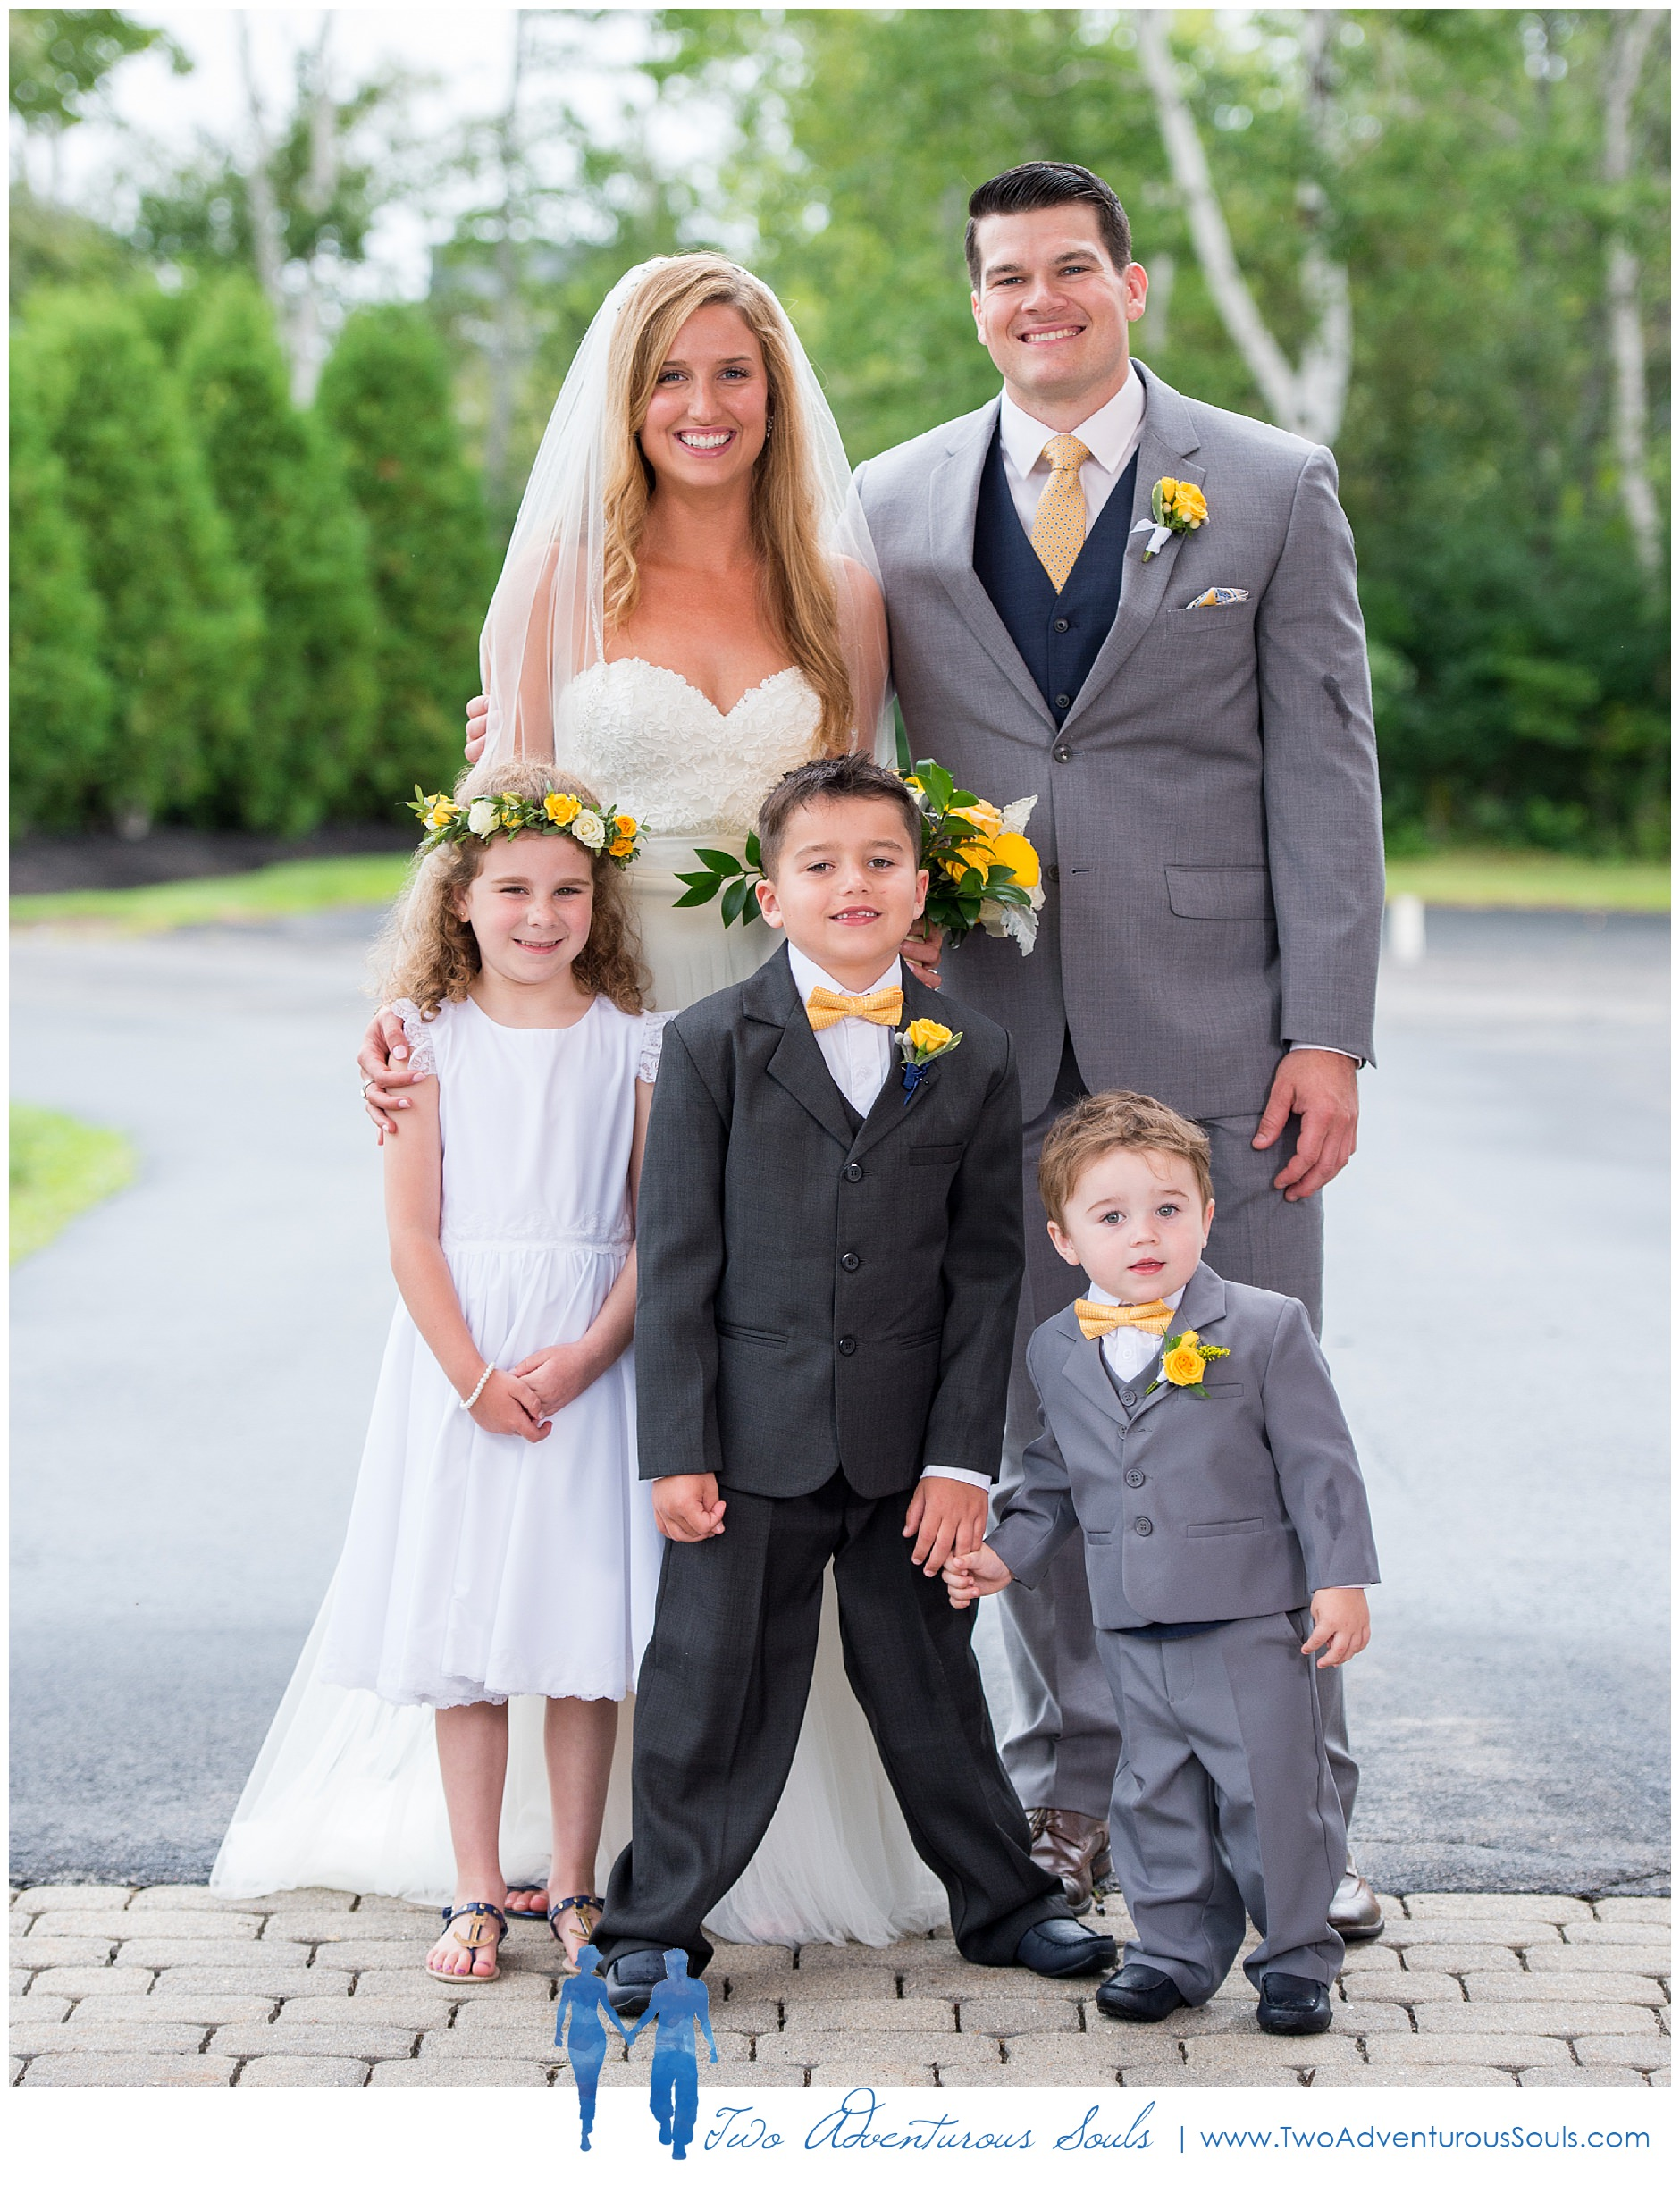 Wedding Day Family Portraits, Wedding Planning, Maine Wedding Photographers, Two Adventurous Souls_WDFPP_0003.jpg